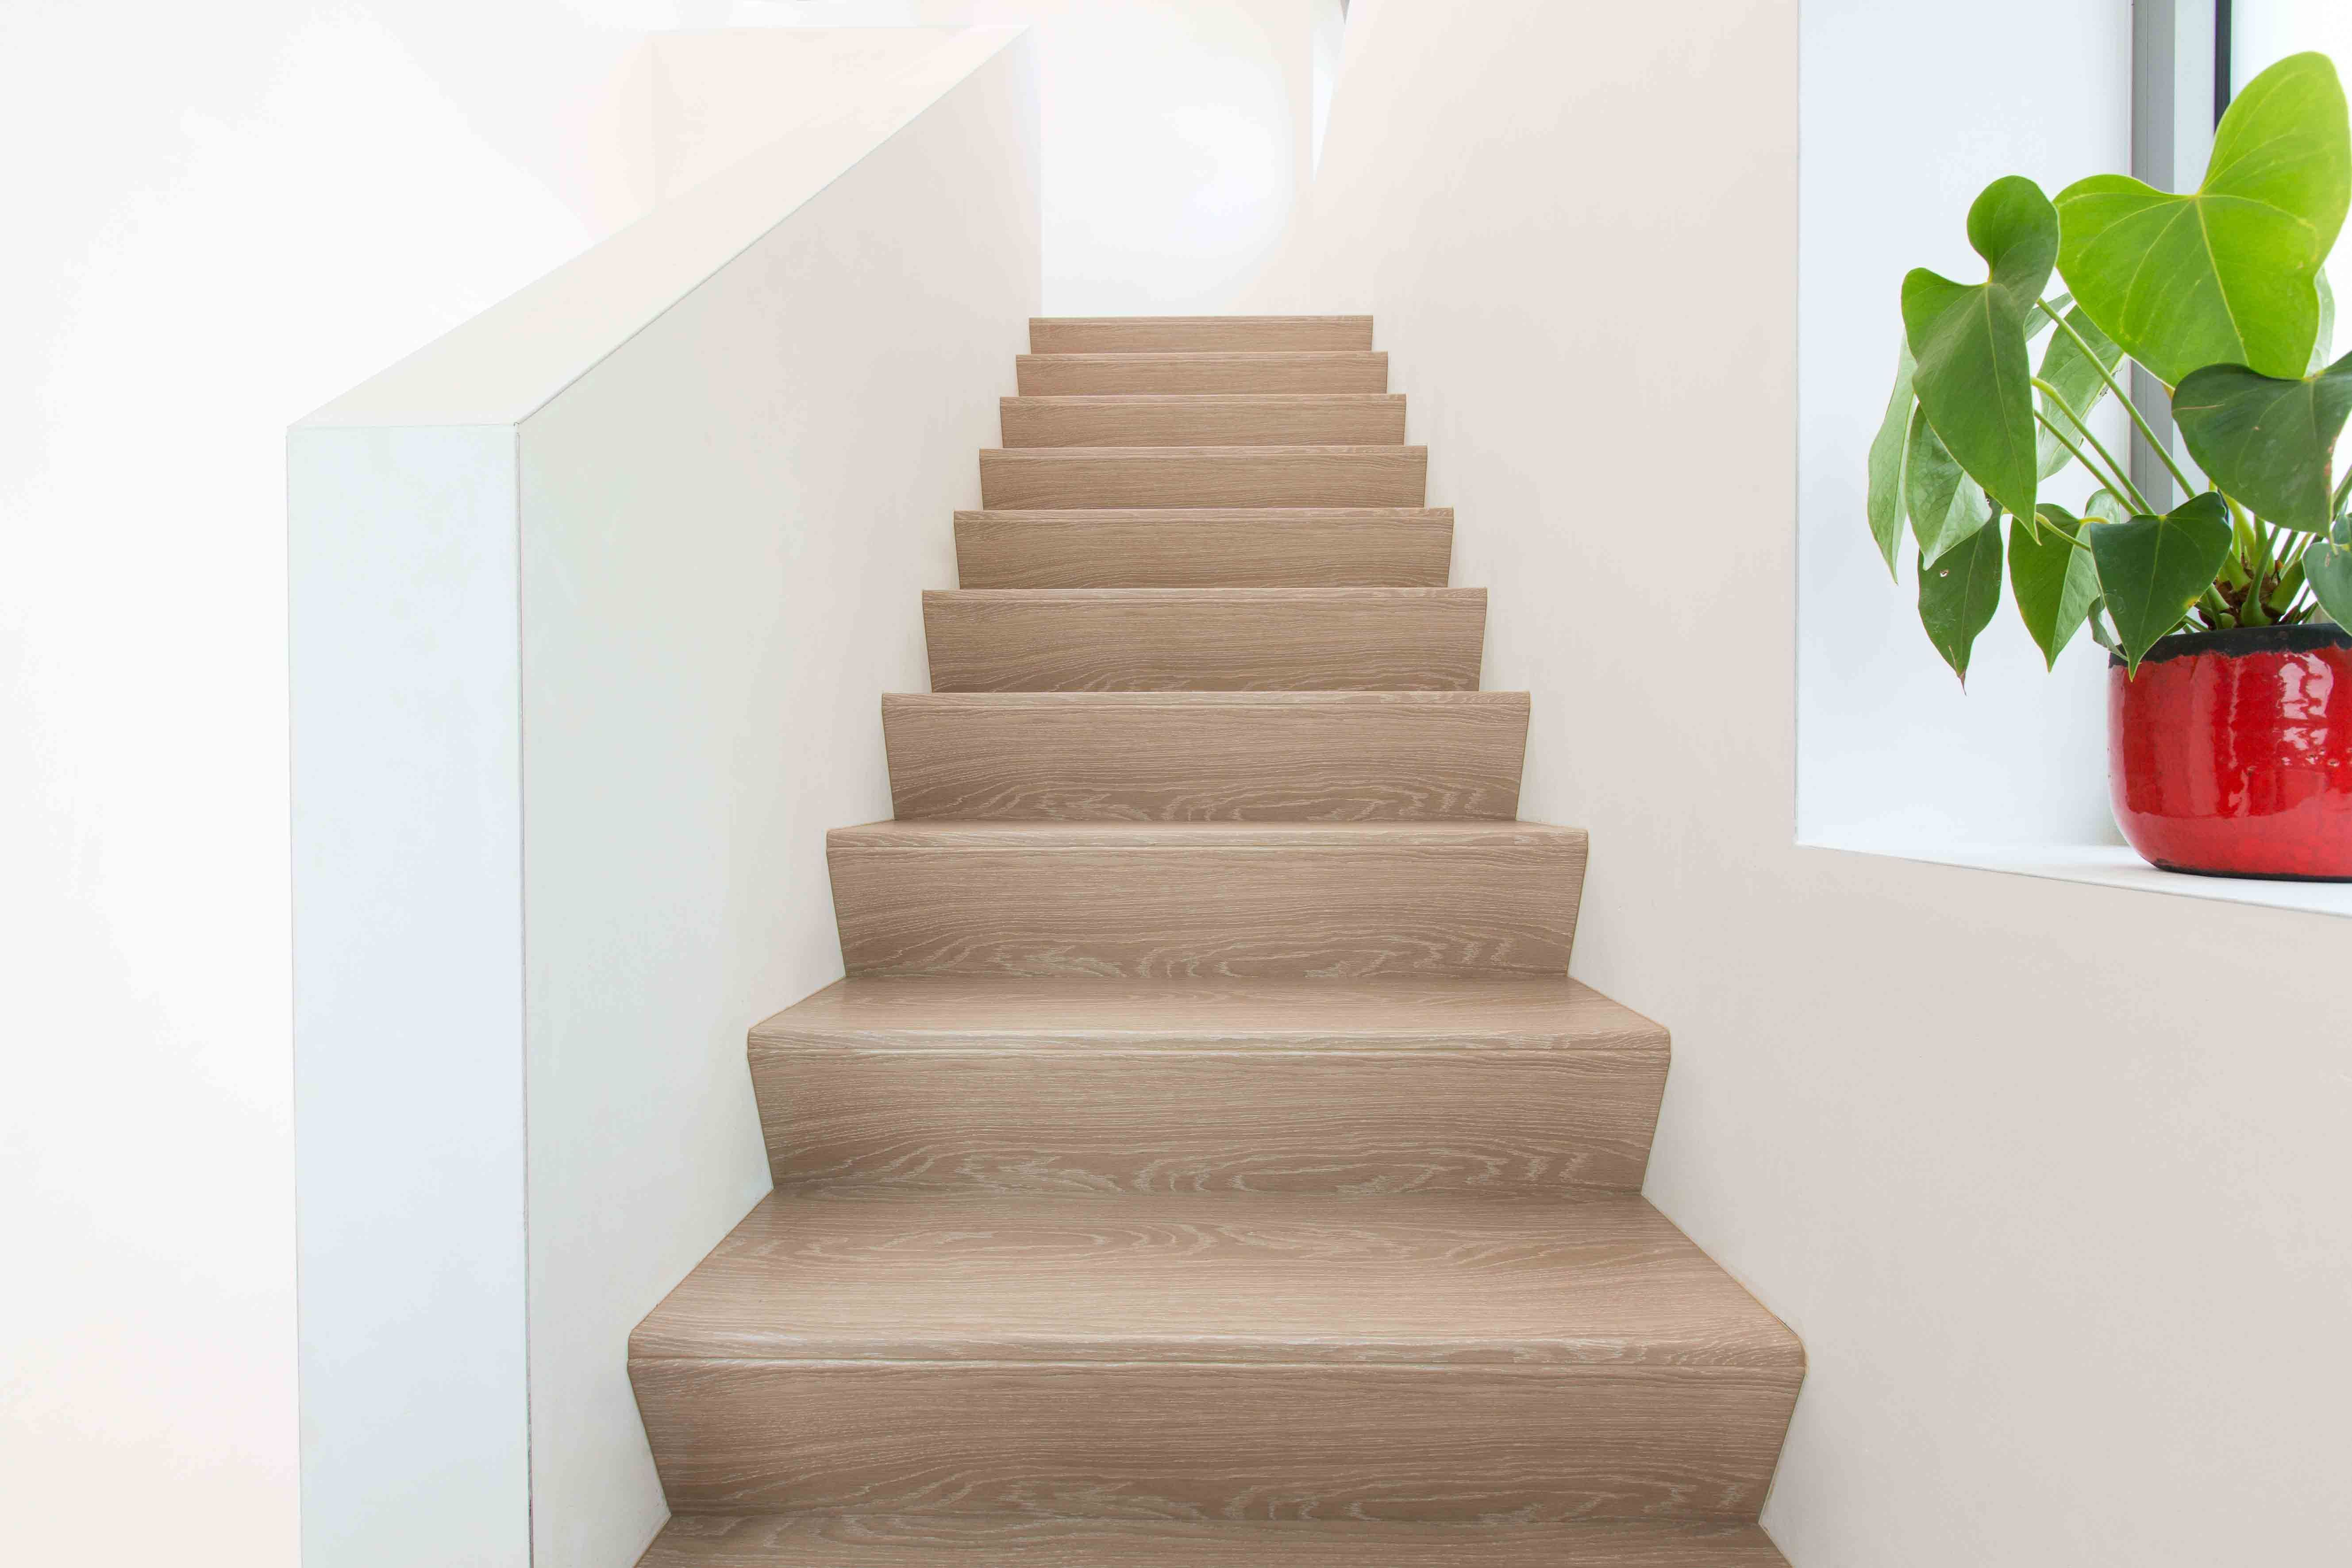 Mooie houten z trap in een moderne hal. hal gang pinterest